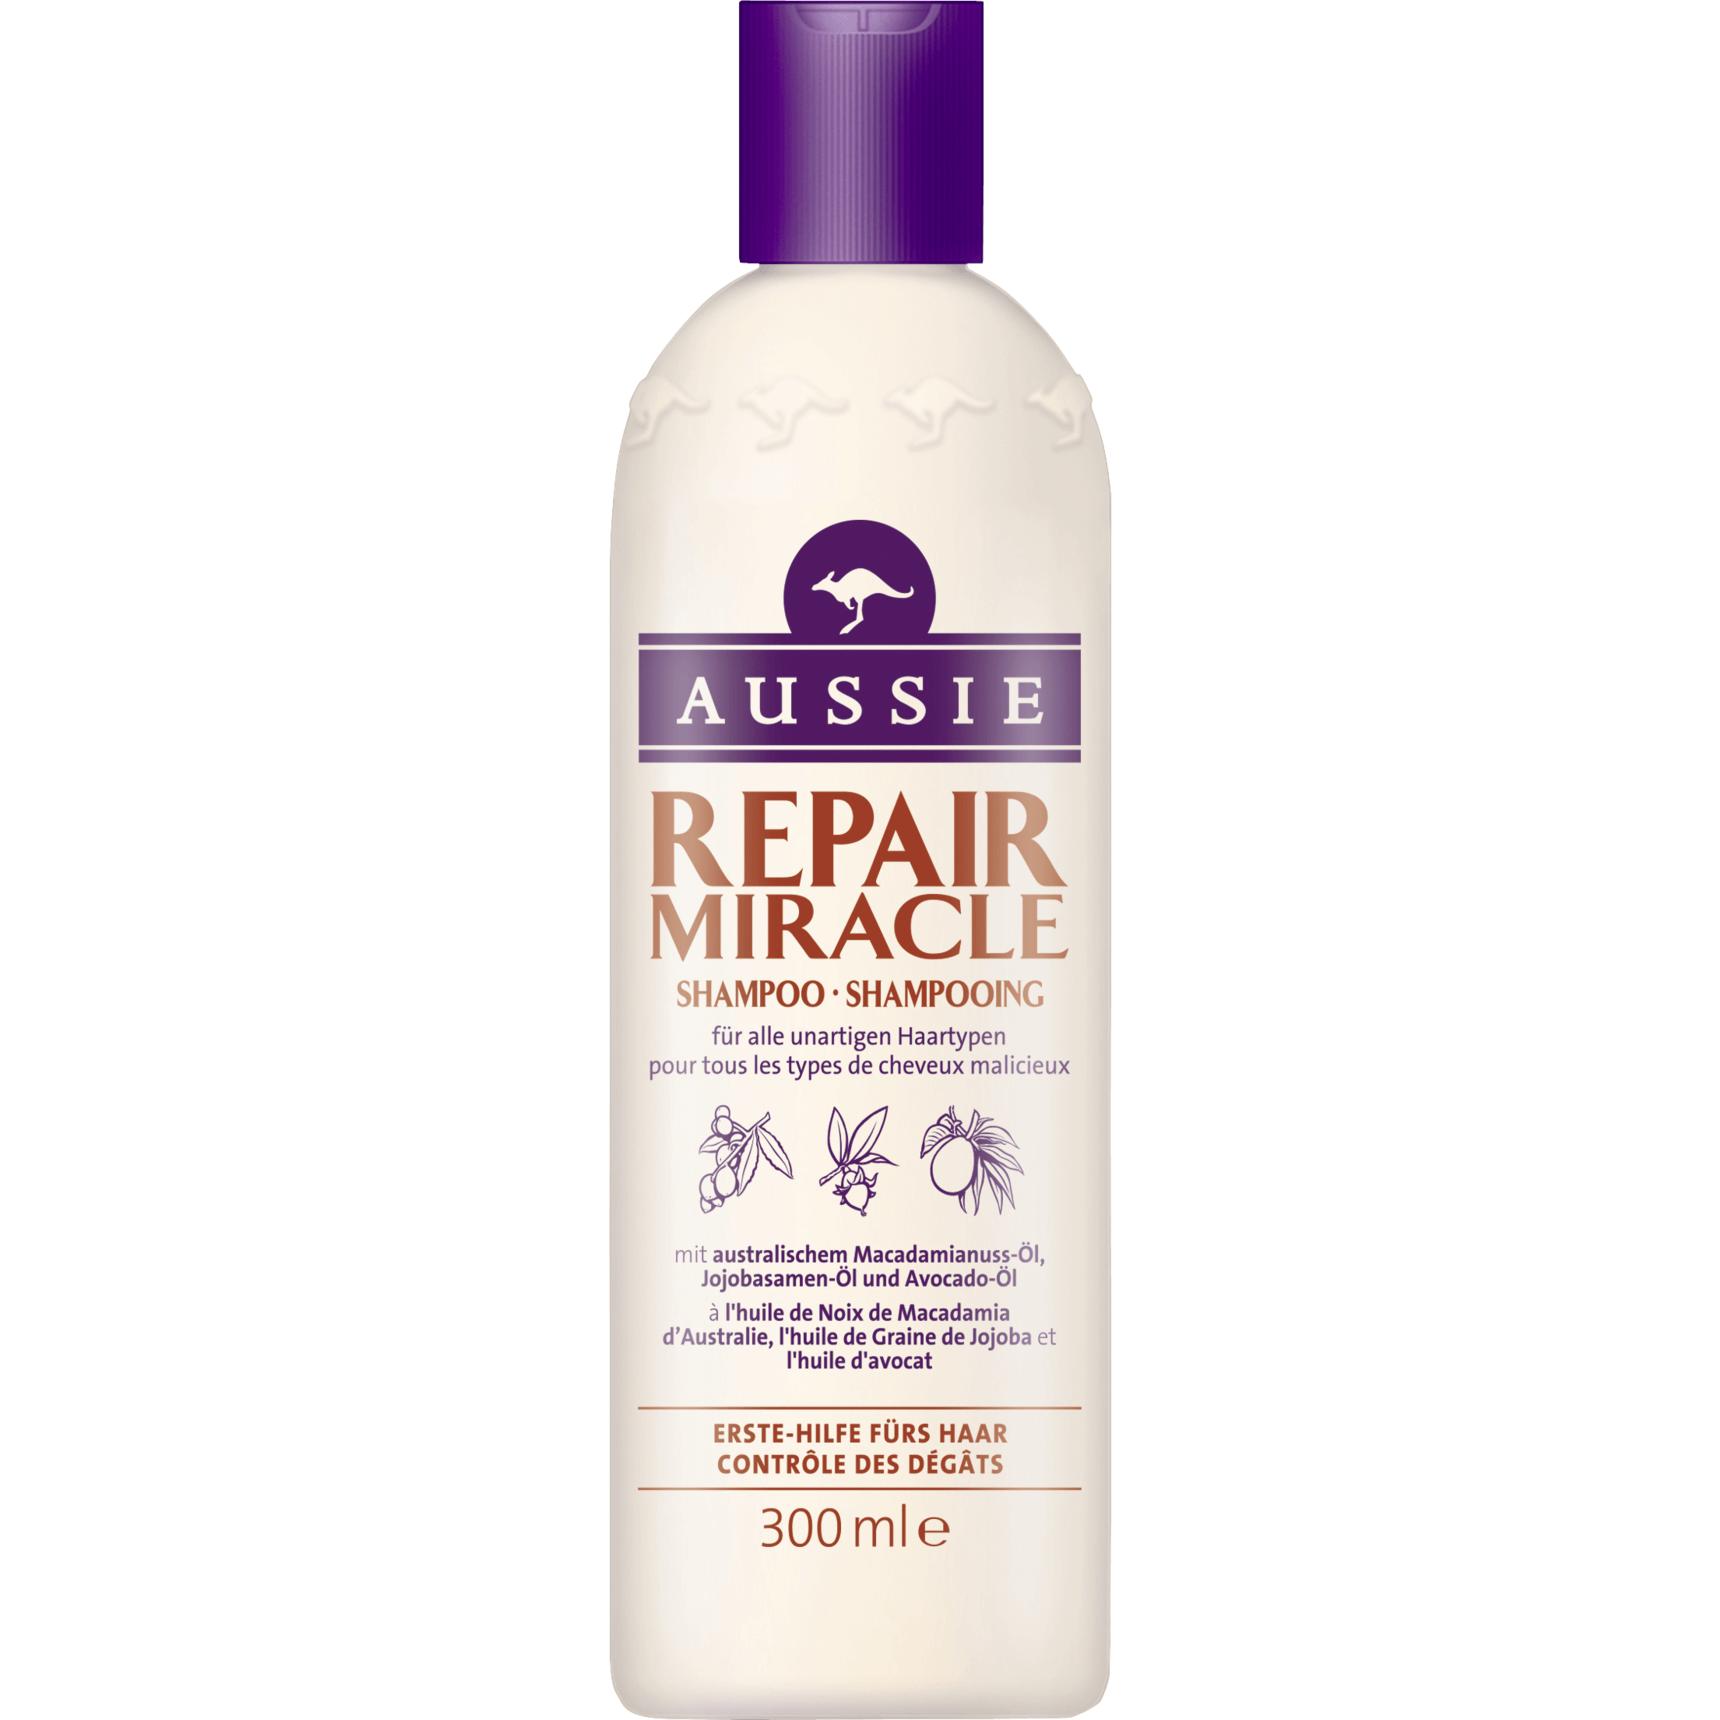 Aussie Repair Miracle Shampoo Damage Control Σαμπουάν για Ατίθασα Μαλλιά 300ml